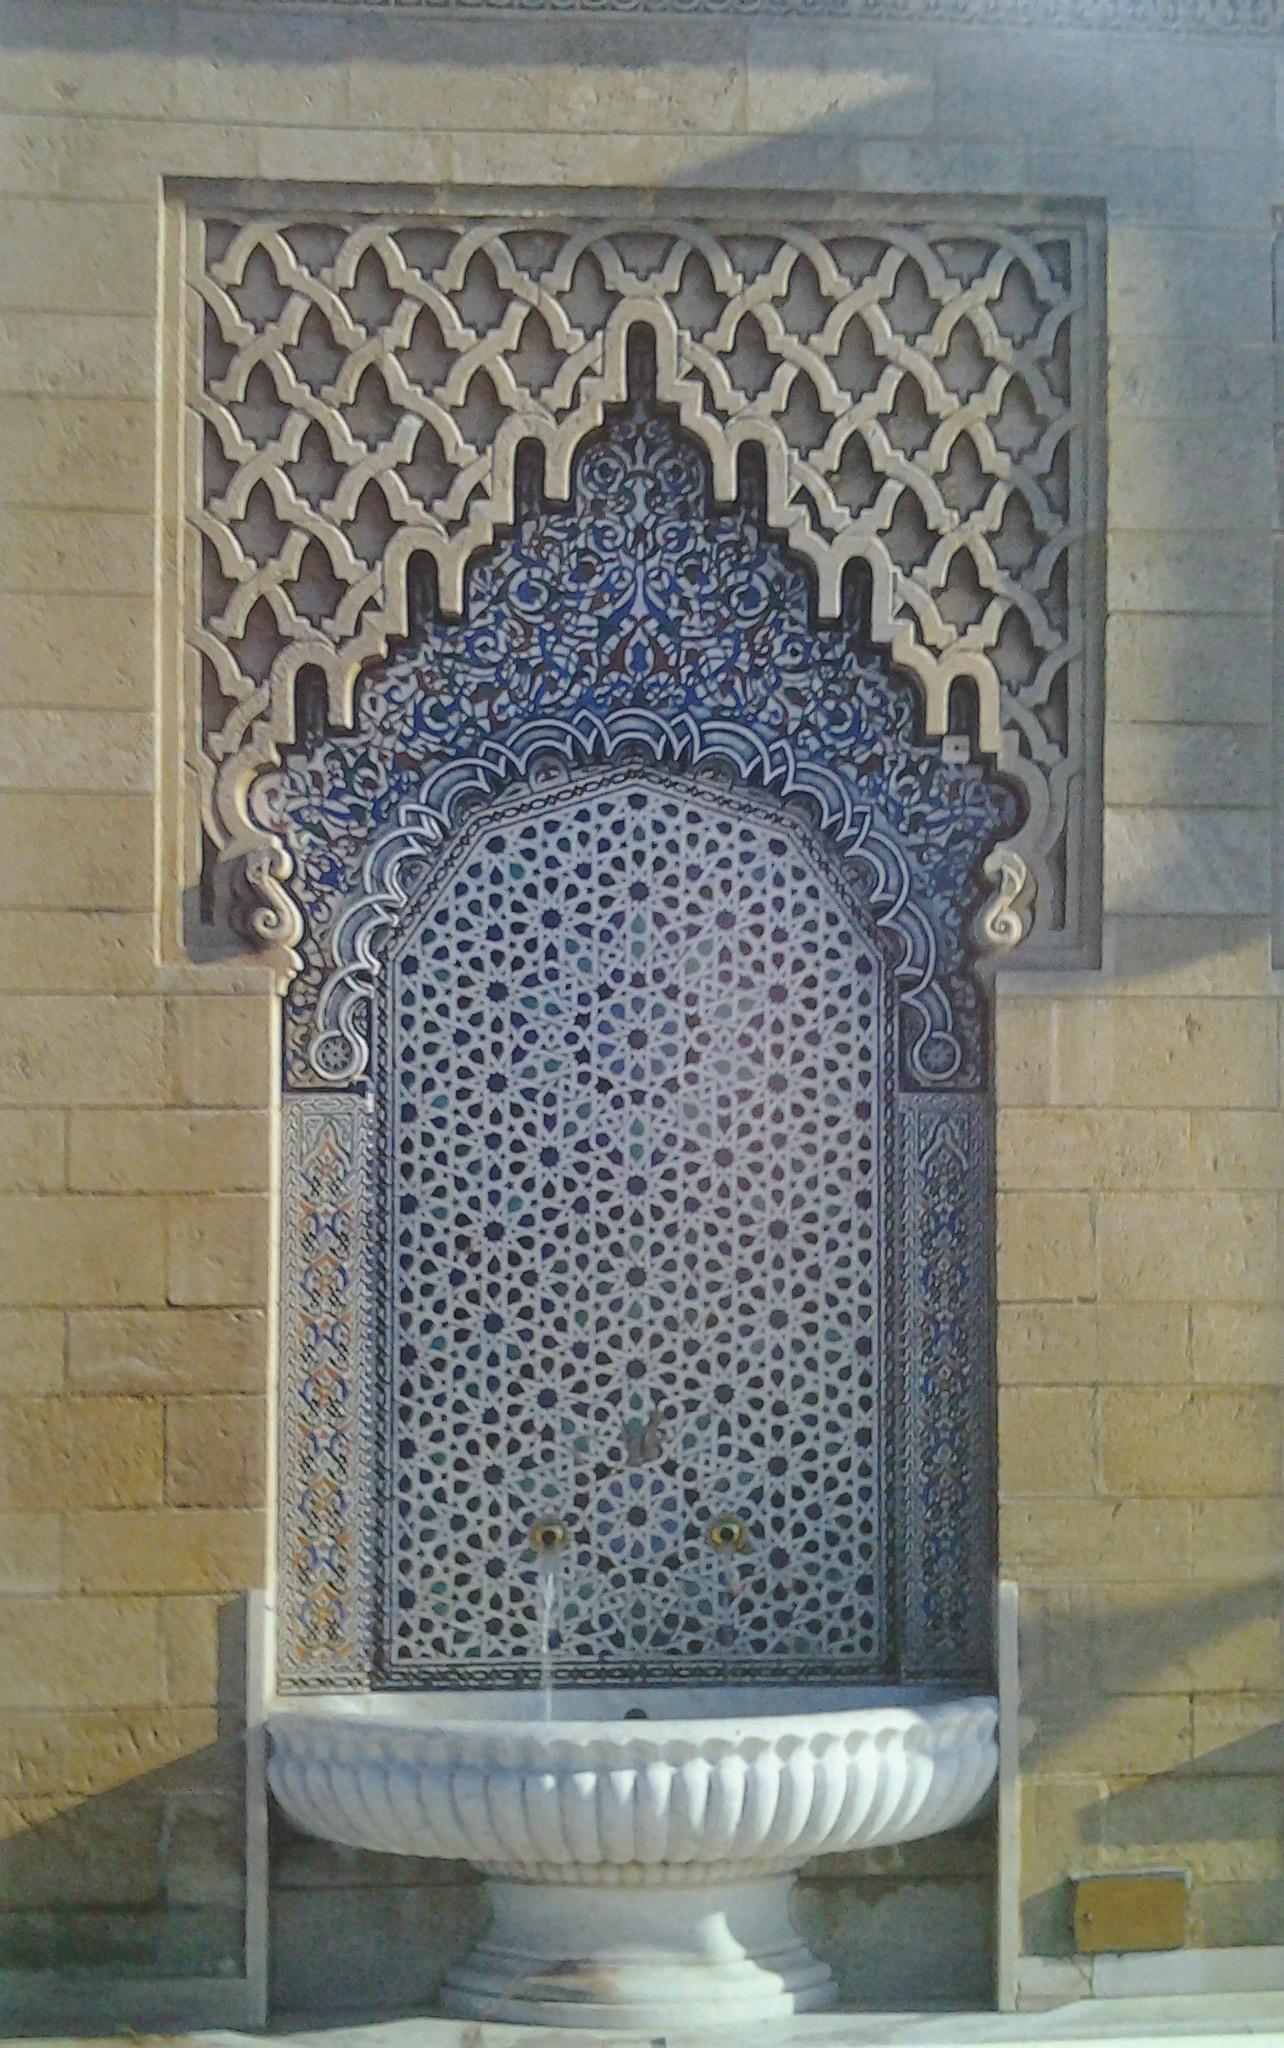 Mausoleum Fountain Mohammed Hand Painted Tile Art Decorative